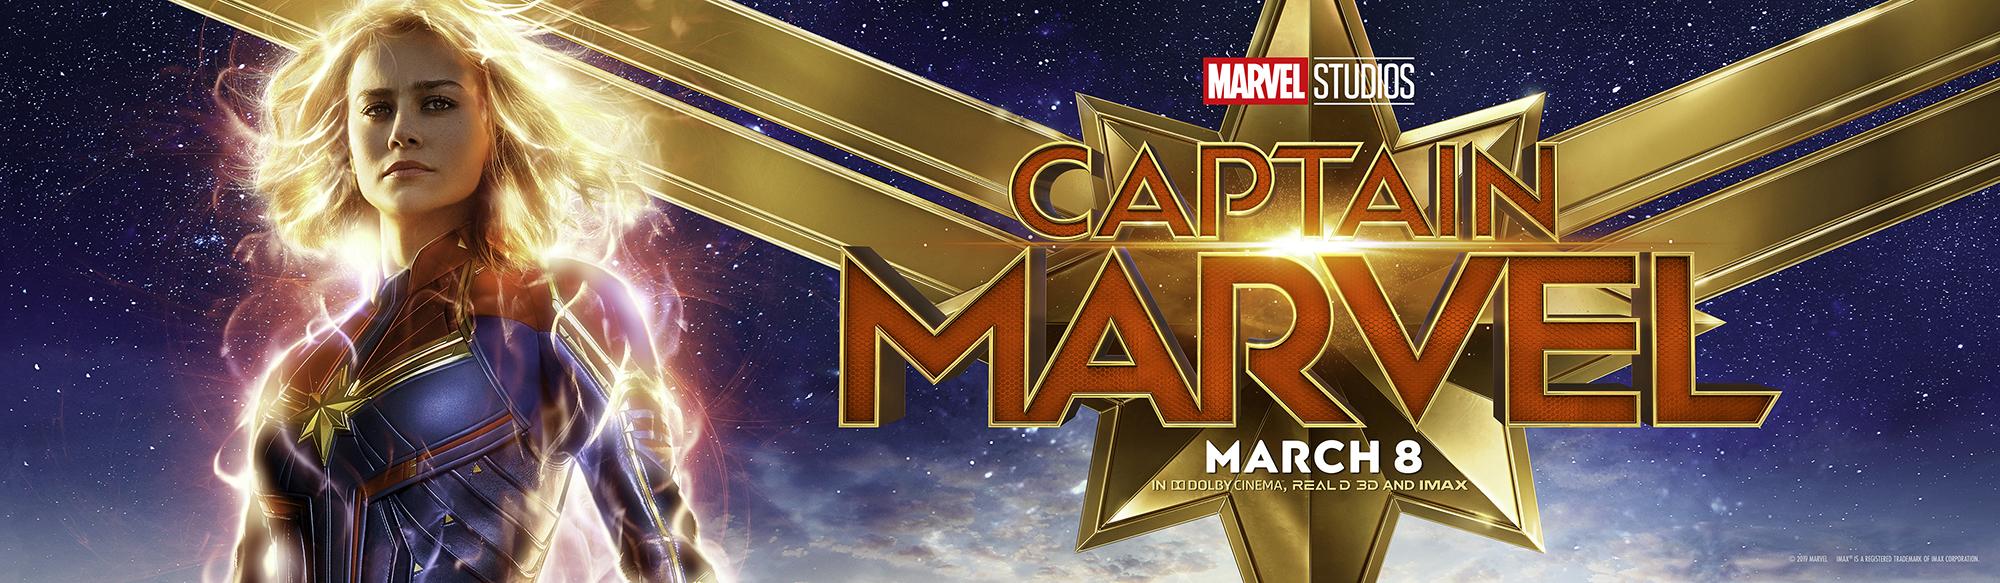 CAPTAIN_MARVEL_RGB_14X48_RGB_100dpi.jpg